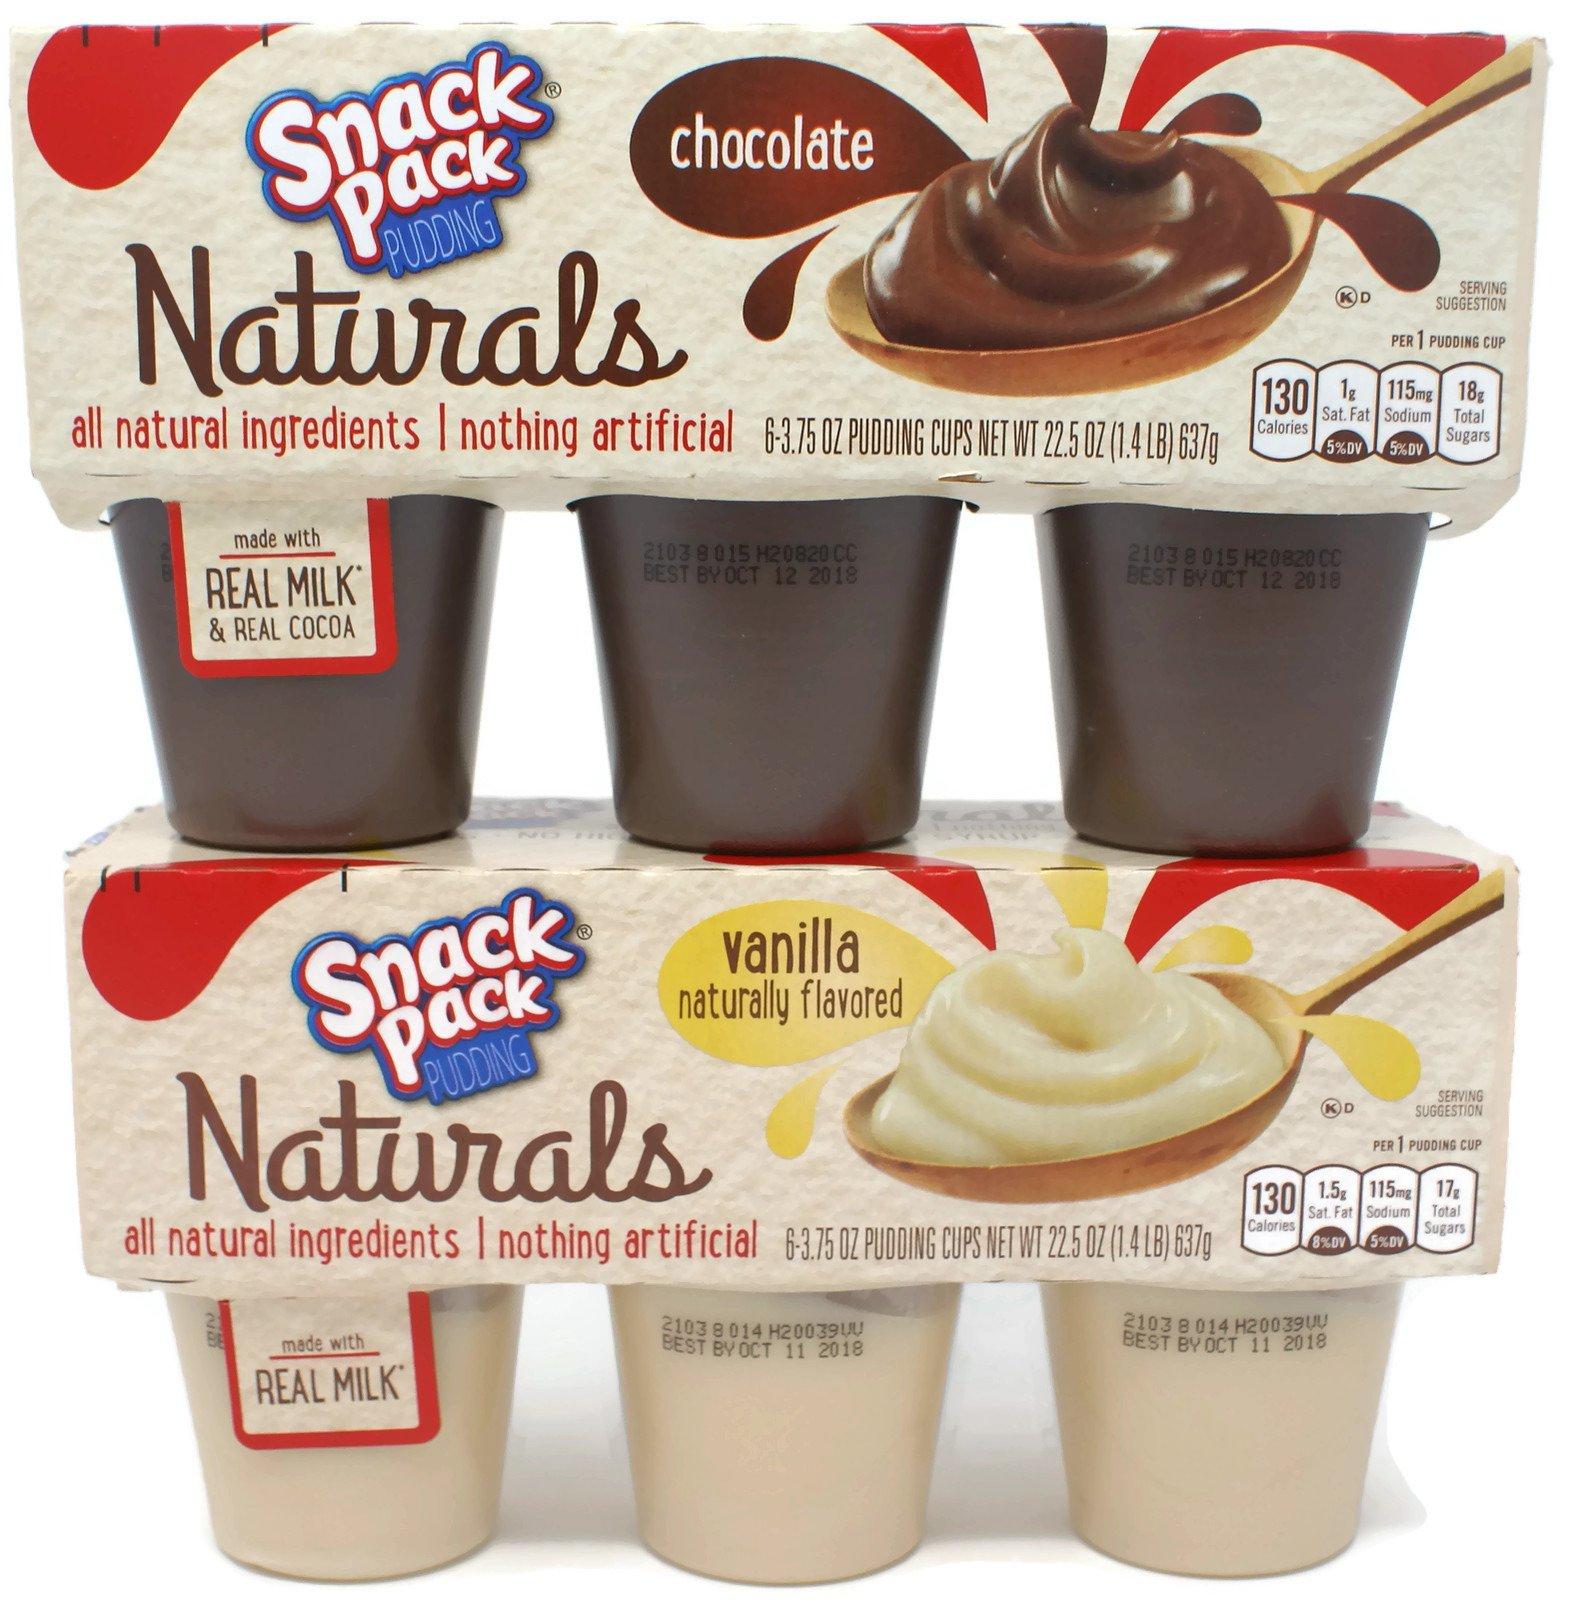 Variety Pack - Snack Pack Pudding Naturals (1 lb 6 oz) - Vanilla, Chocolate